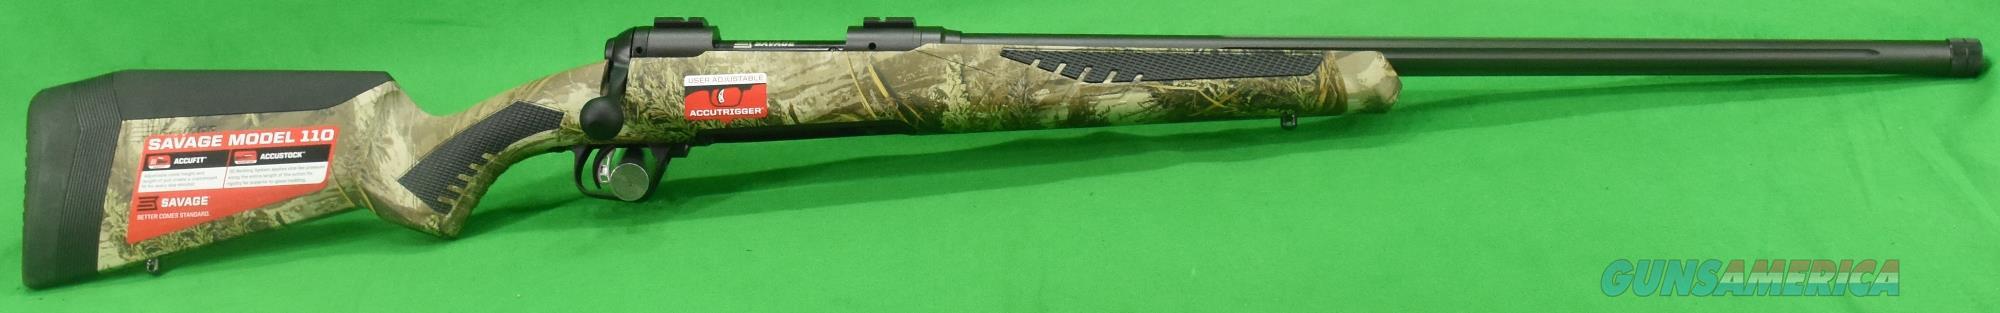 110 Predator Max1 308Win 24In  57141  Guns > Rifles > Savage Rifles > 10/110